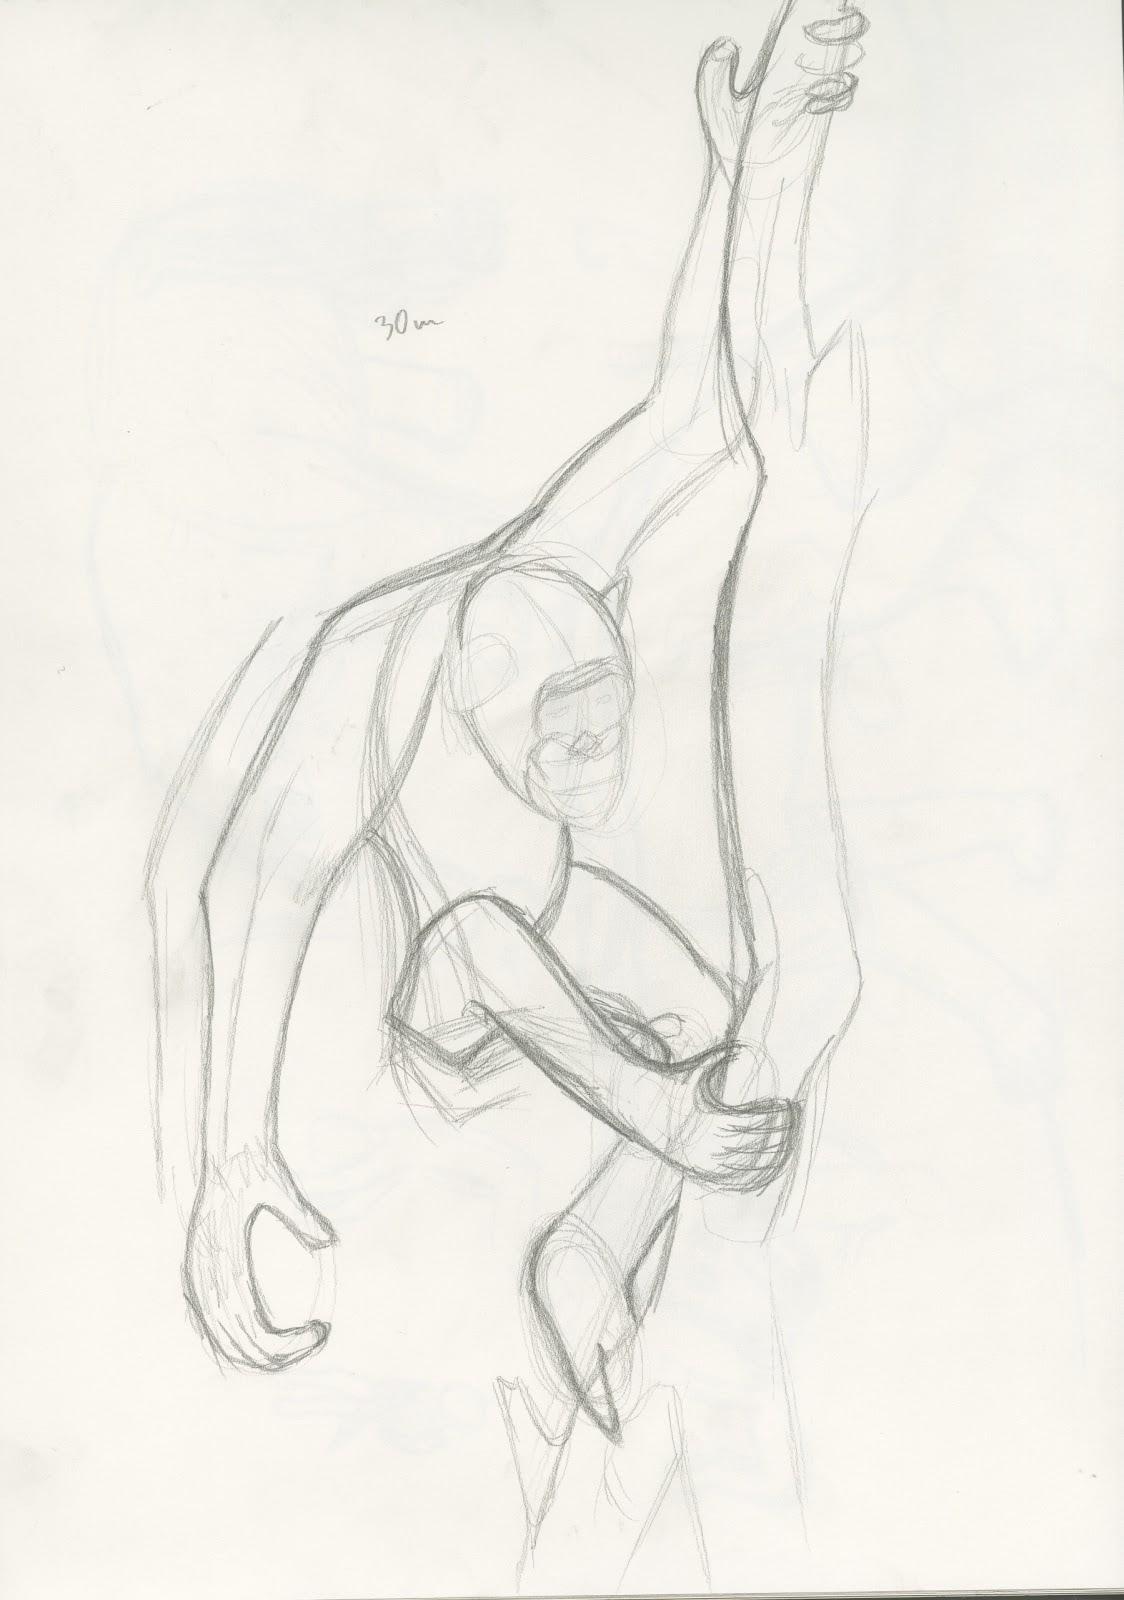 Observational Drawing 2: Week8 - Life Drawing - Non human anatomy